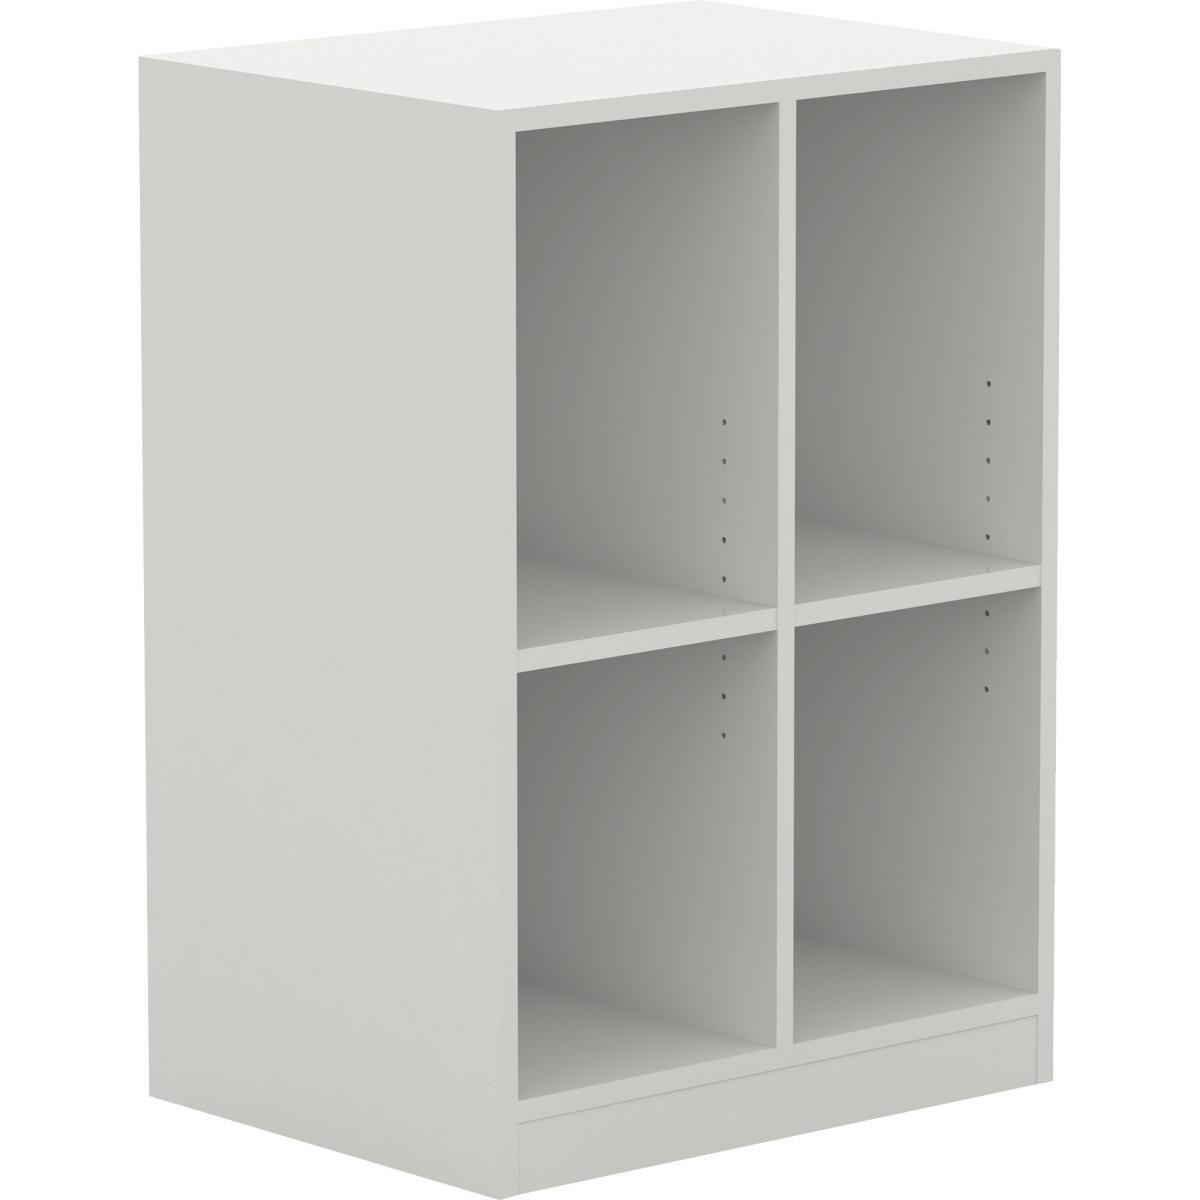 Lorell LLR42401 23.6 x 17.8 x 34.4 in. Double Cubby & Locker Storage Base, White